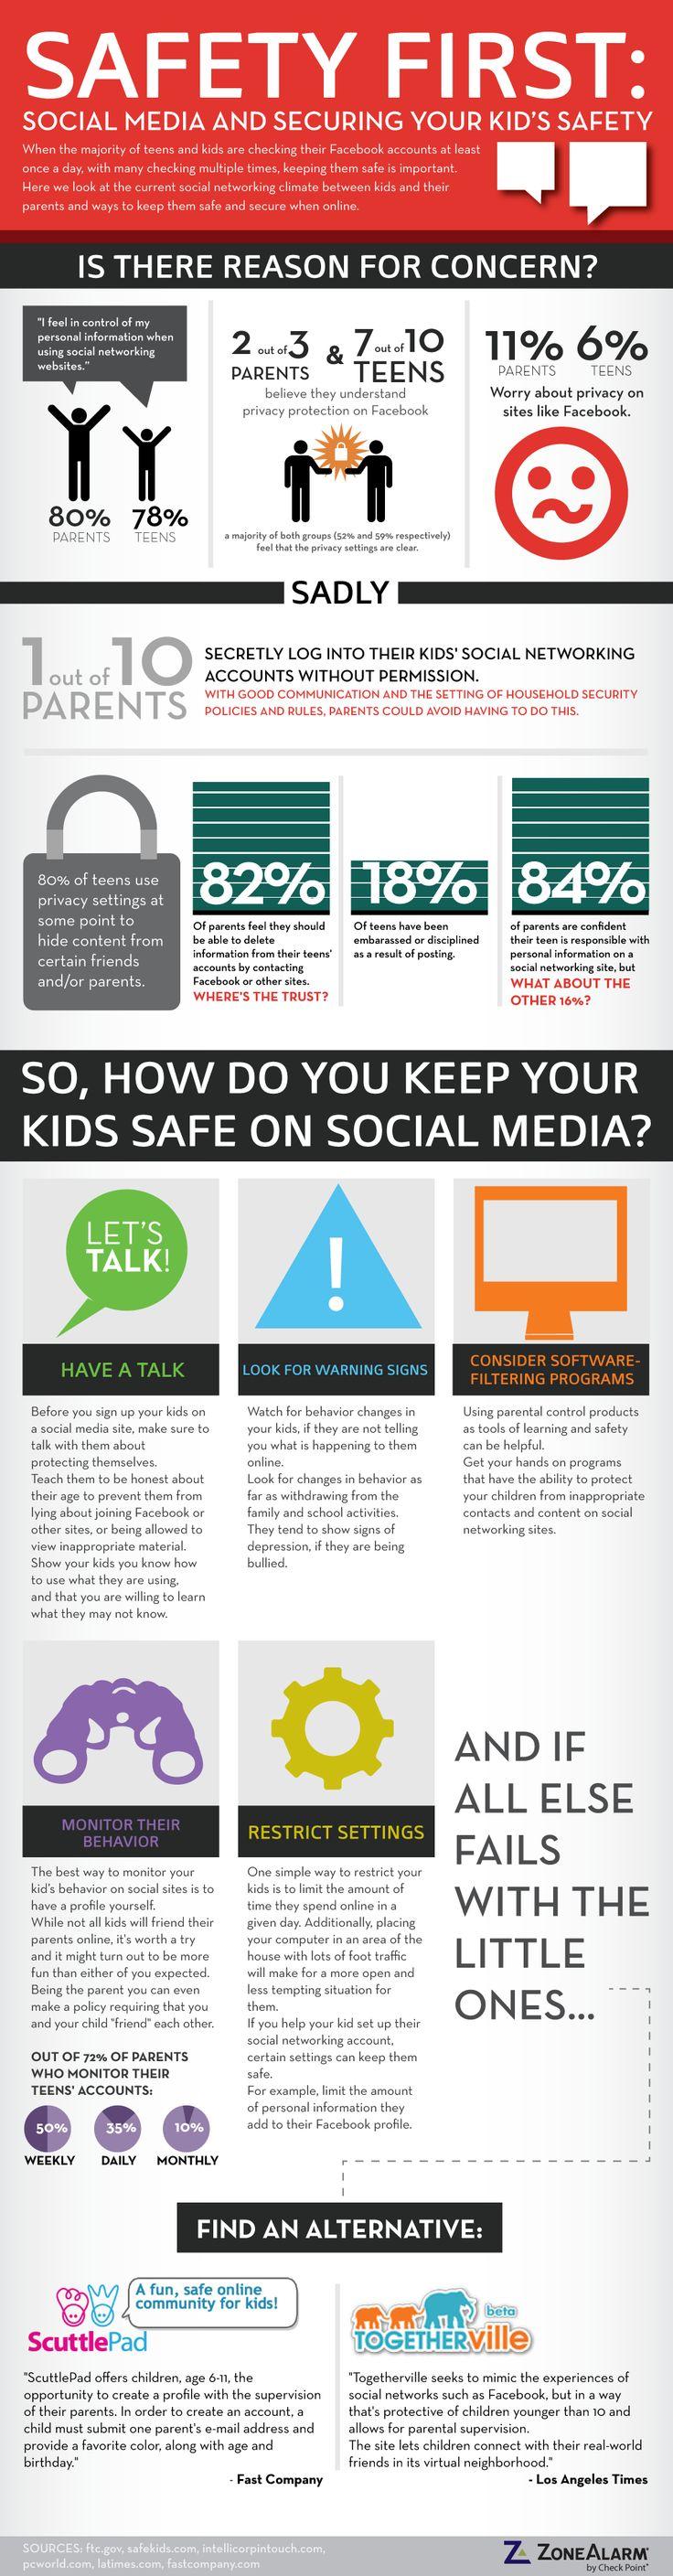 best 25 kids safety ideas on pinterest child safety stranger